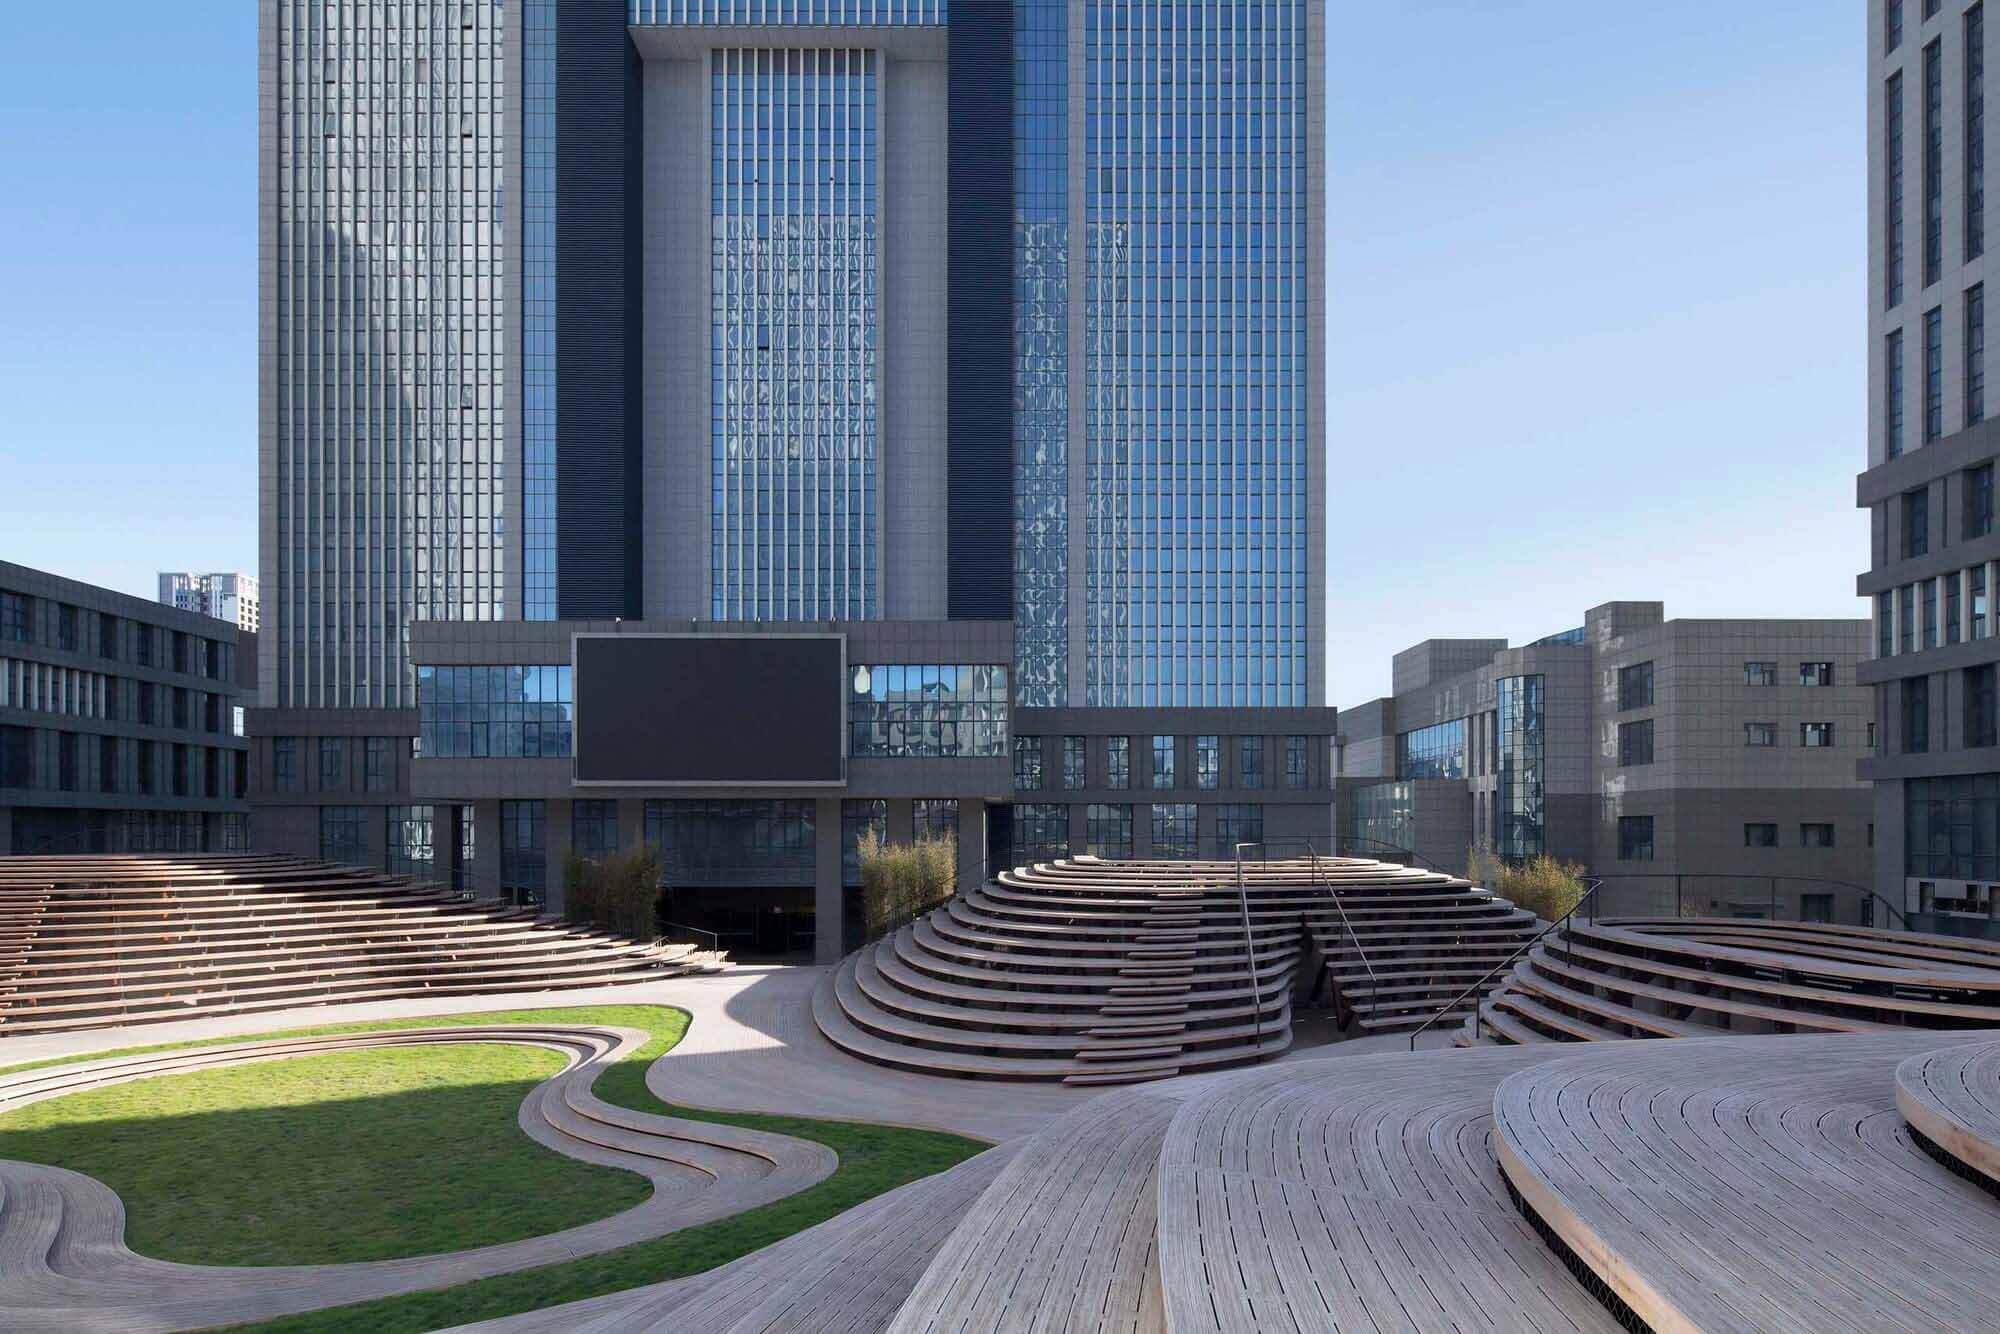 Бамбуковый холм — Тяньцзинь Vision Hill Plaza / Origin Architect